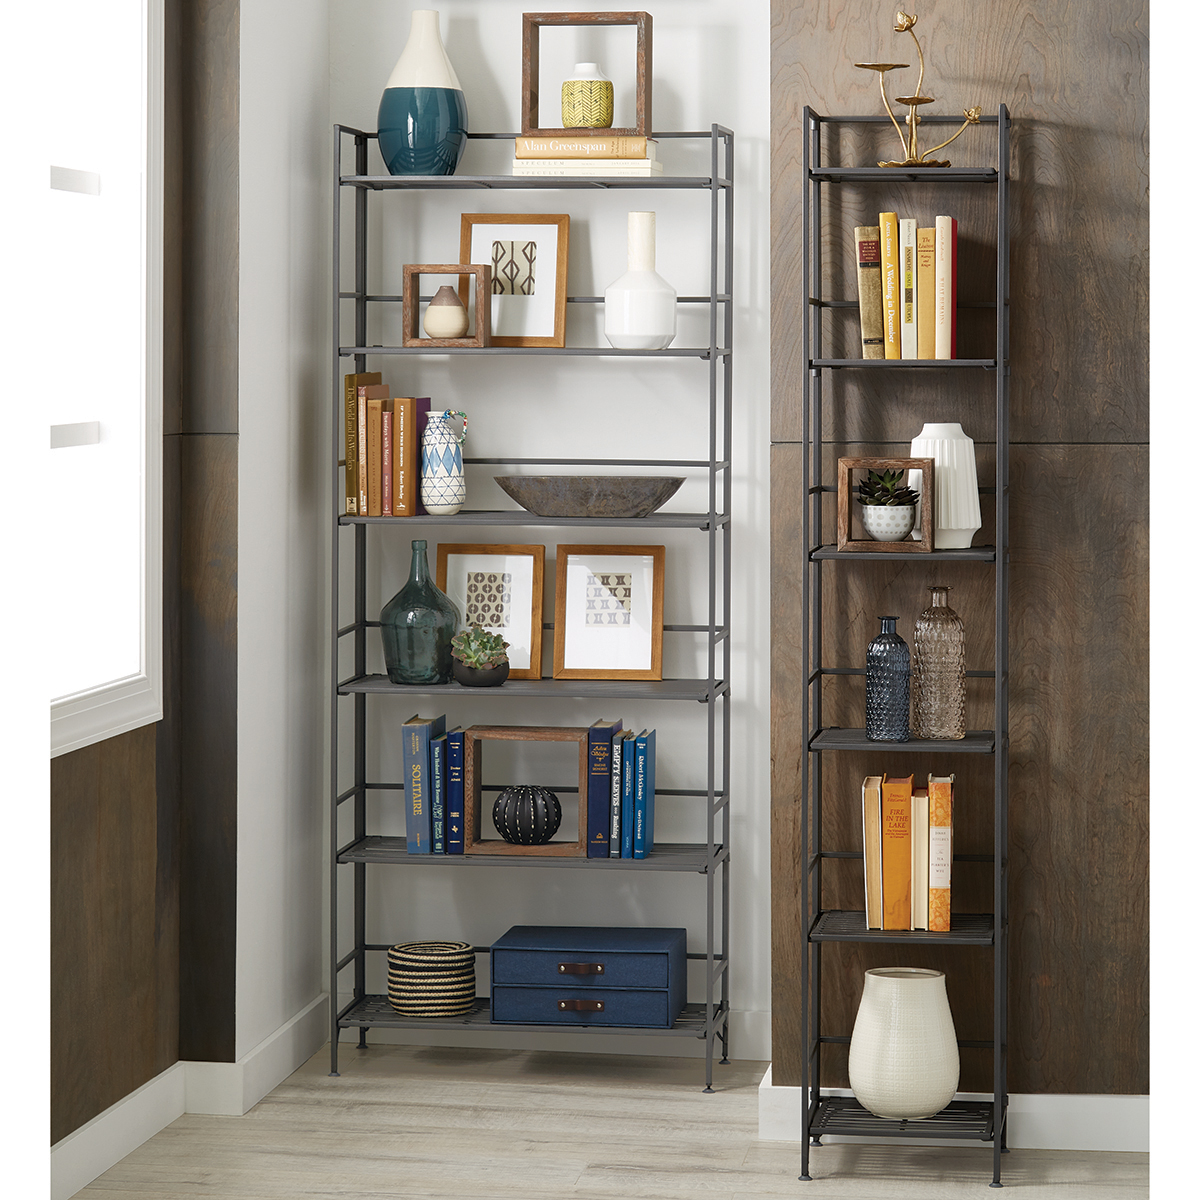 6 Shelf Iron Folding Bookshelf